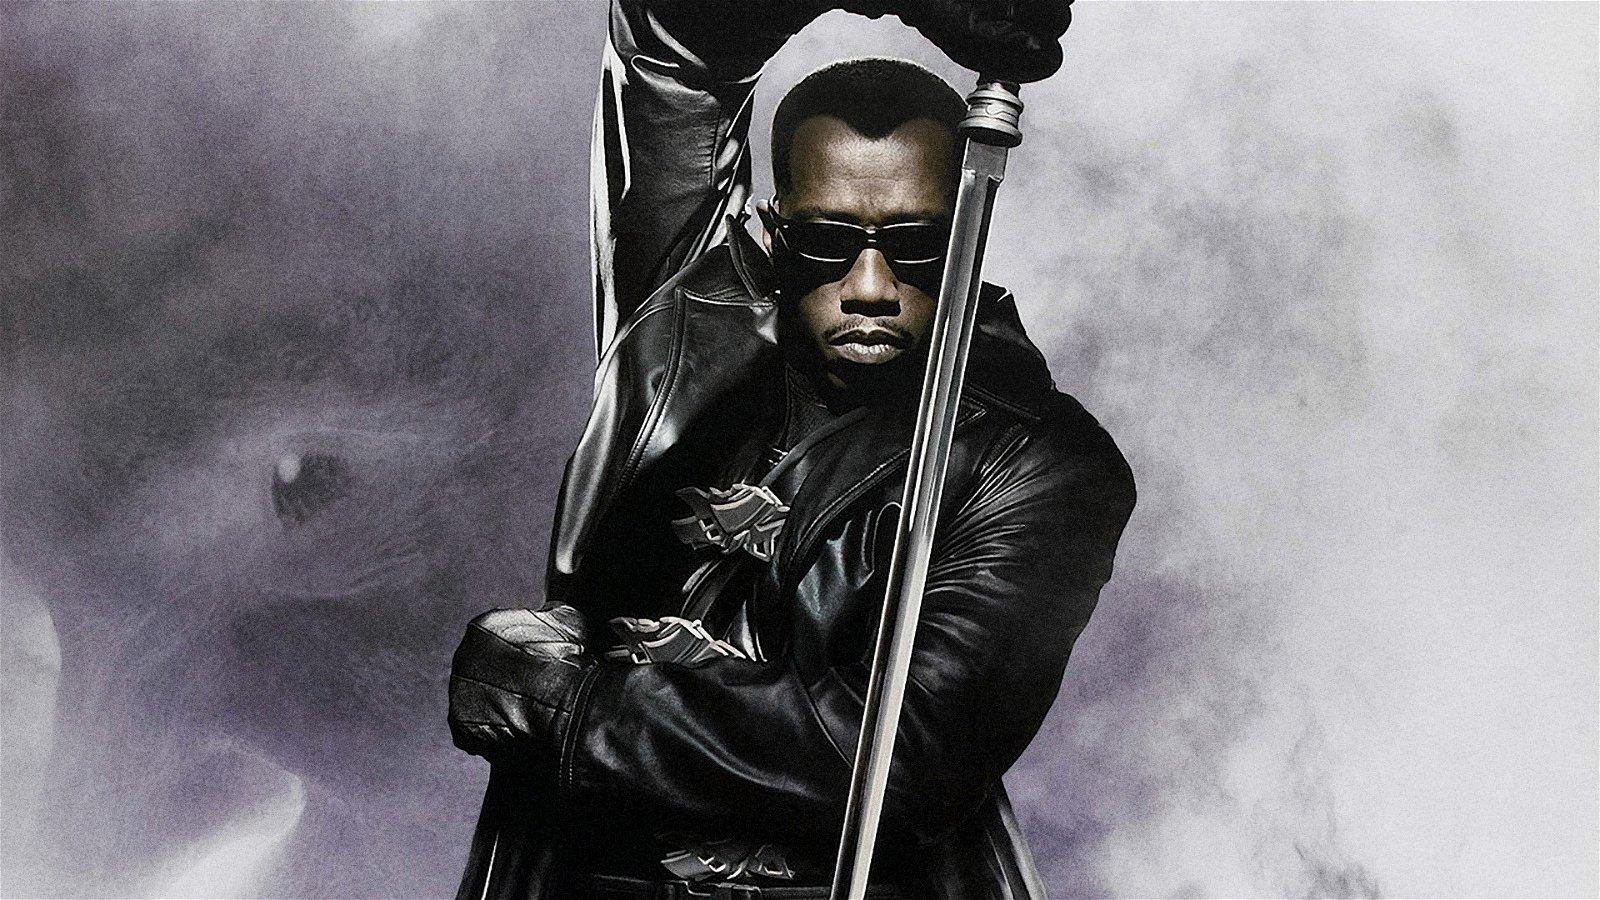 Wesley Snipes Denies Hard Feelings or Issues On Set of Blade Trinity